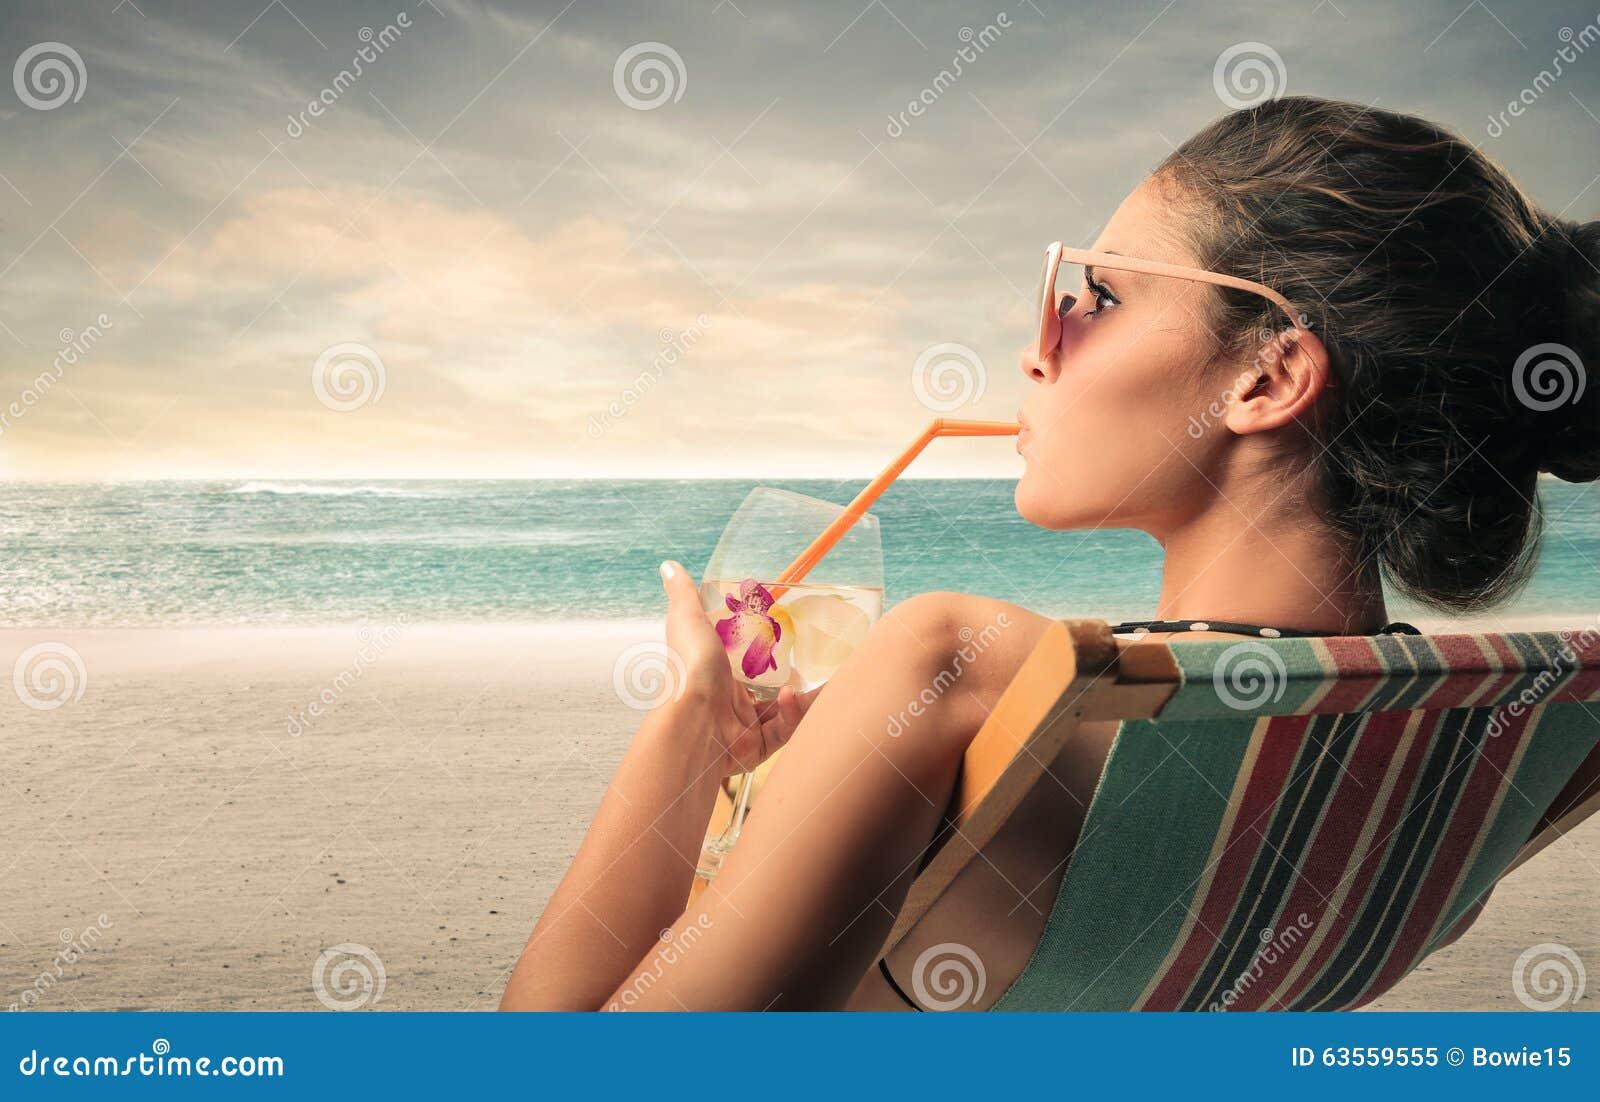 Refresco en la playa